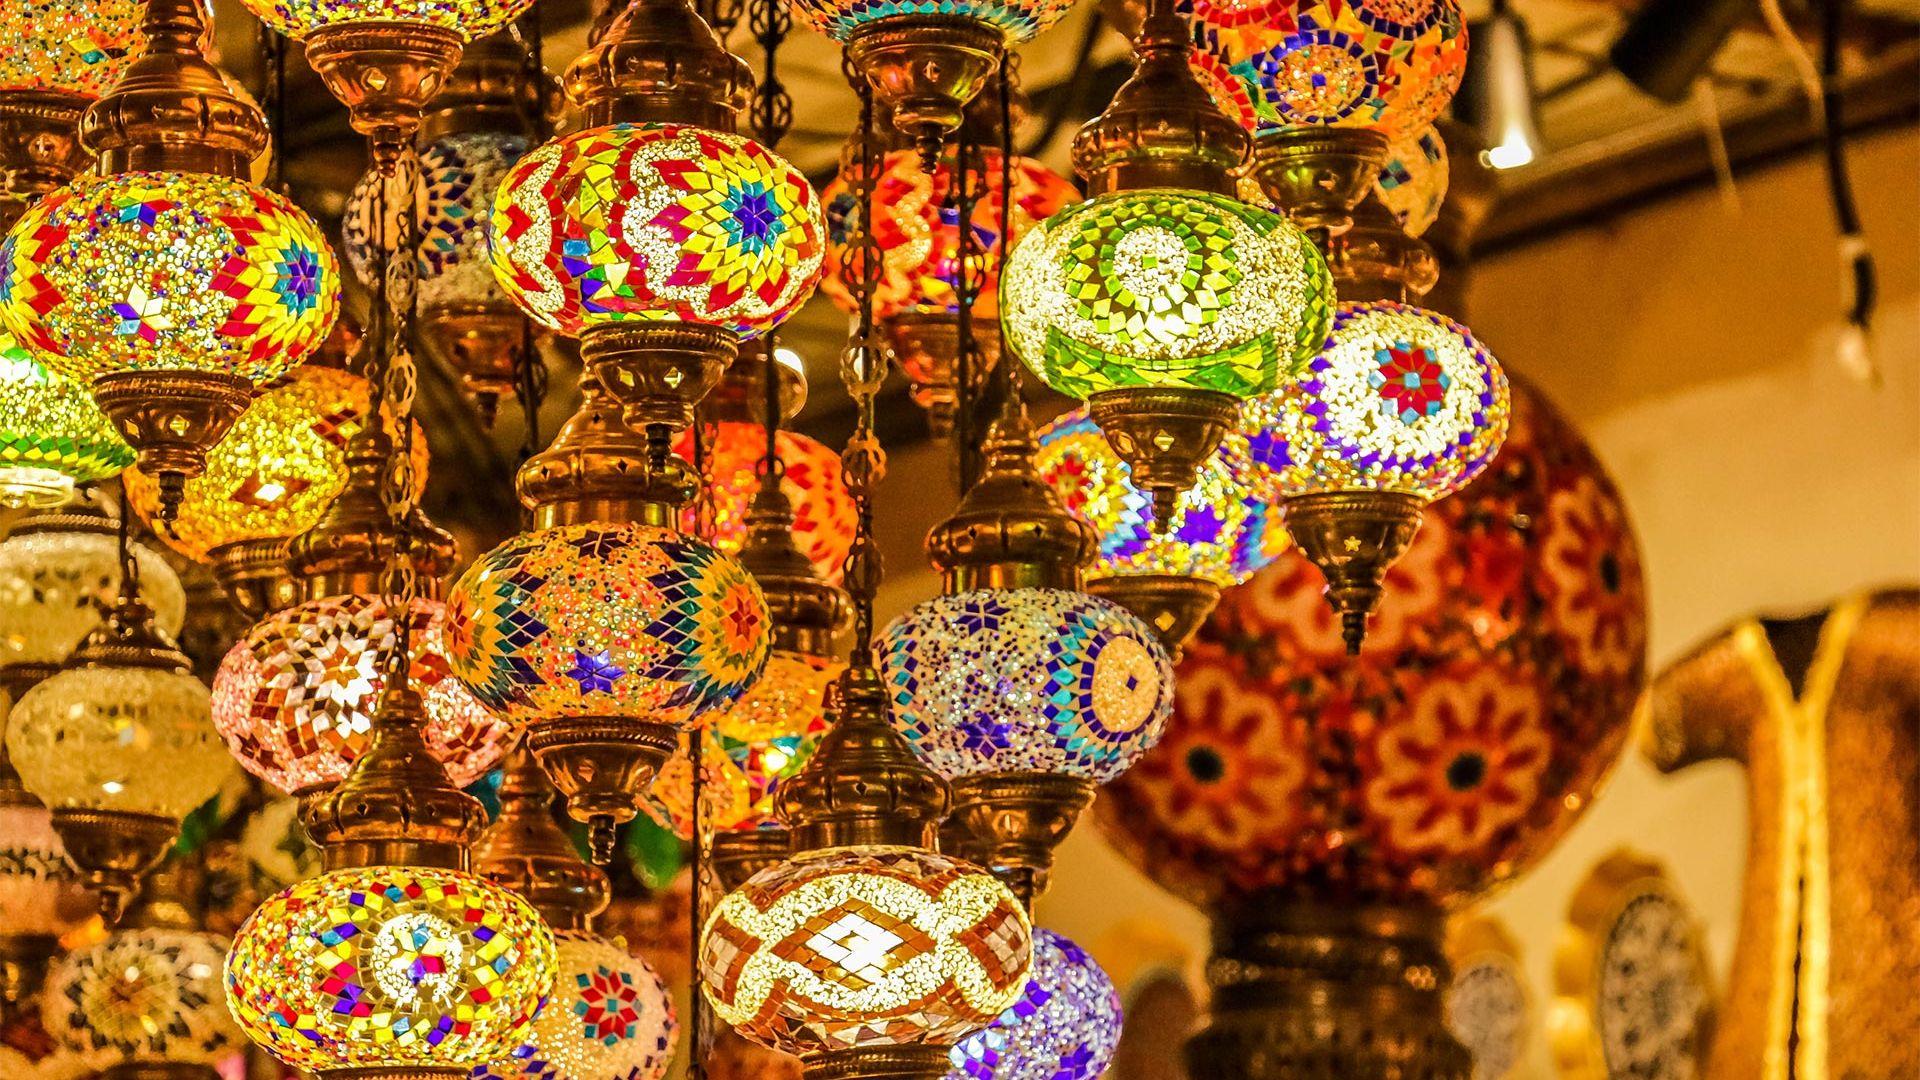 Best Deal Travelhubx - Sejur plaja charter Dubai - 8 zile - decembrie 2021